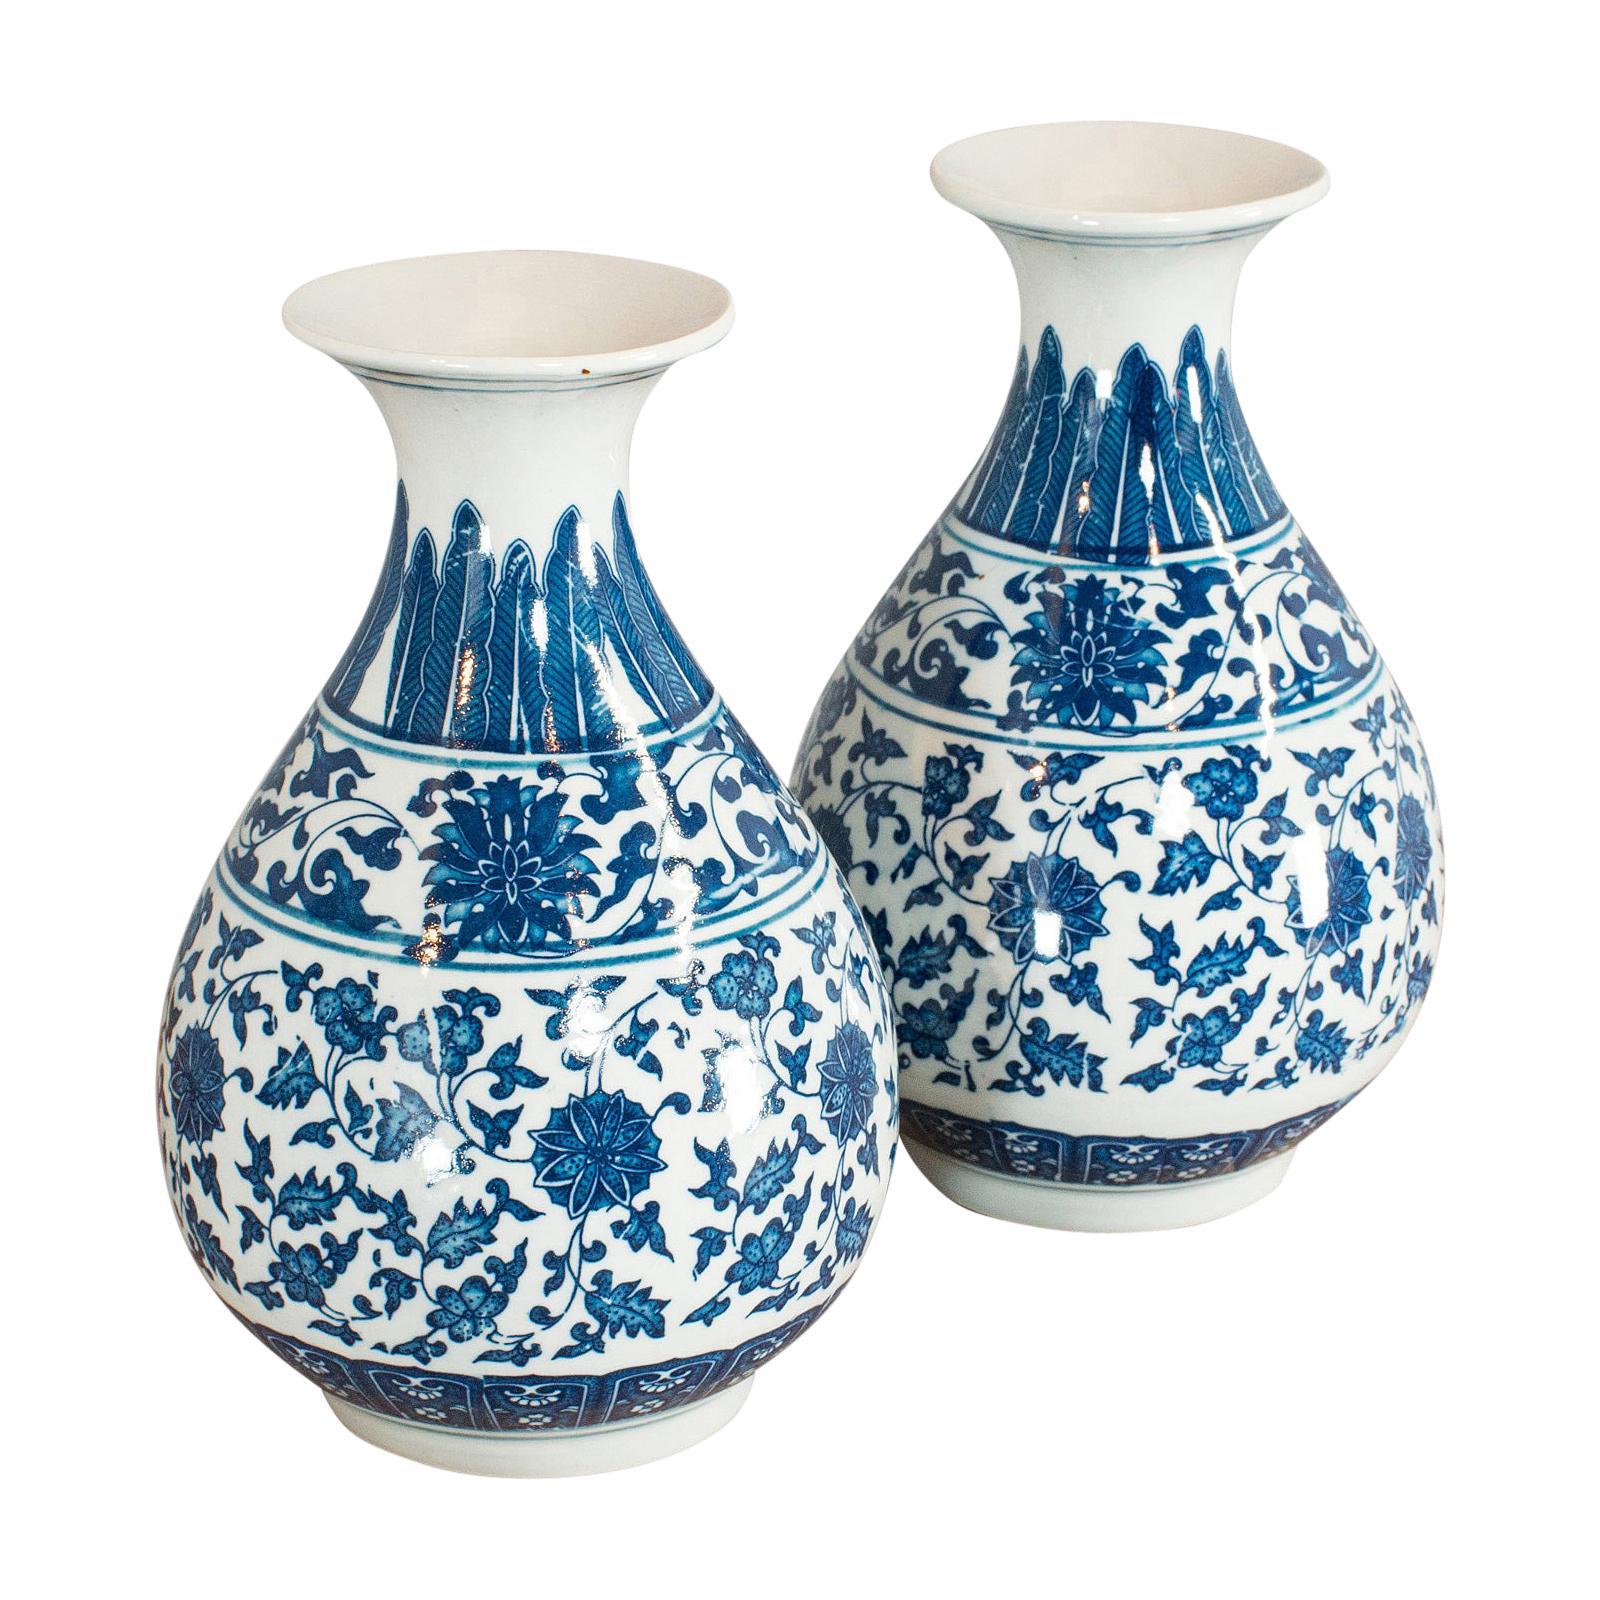 Pair of, Vintage Decorative Vases, Oriental, Ceramic, Baluster Urn, 20th Century